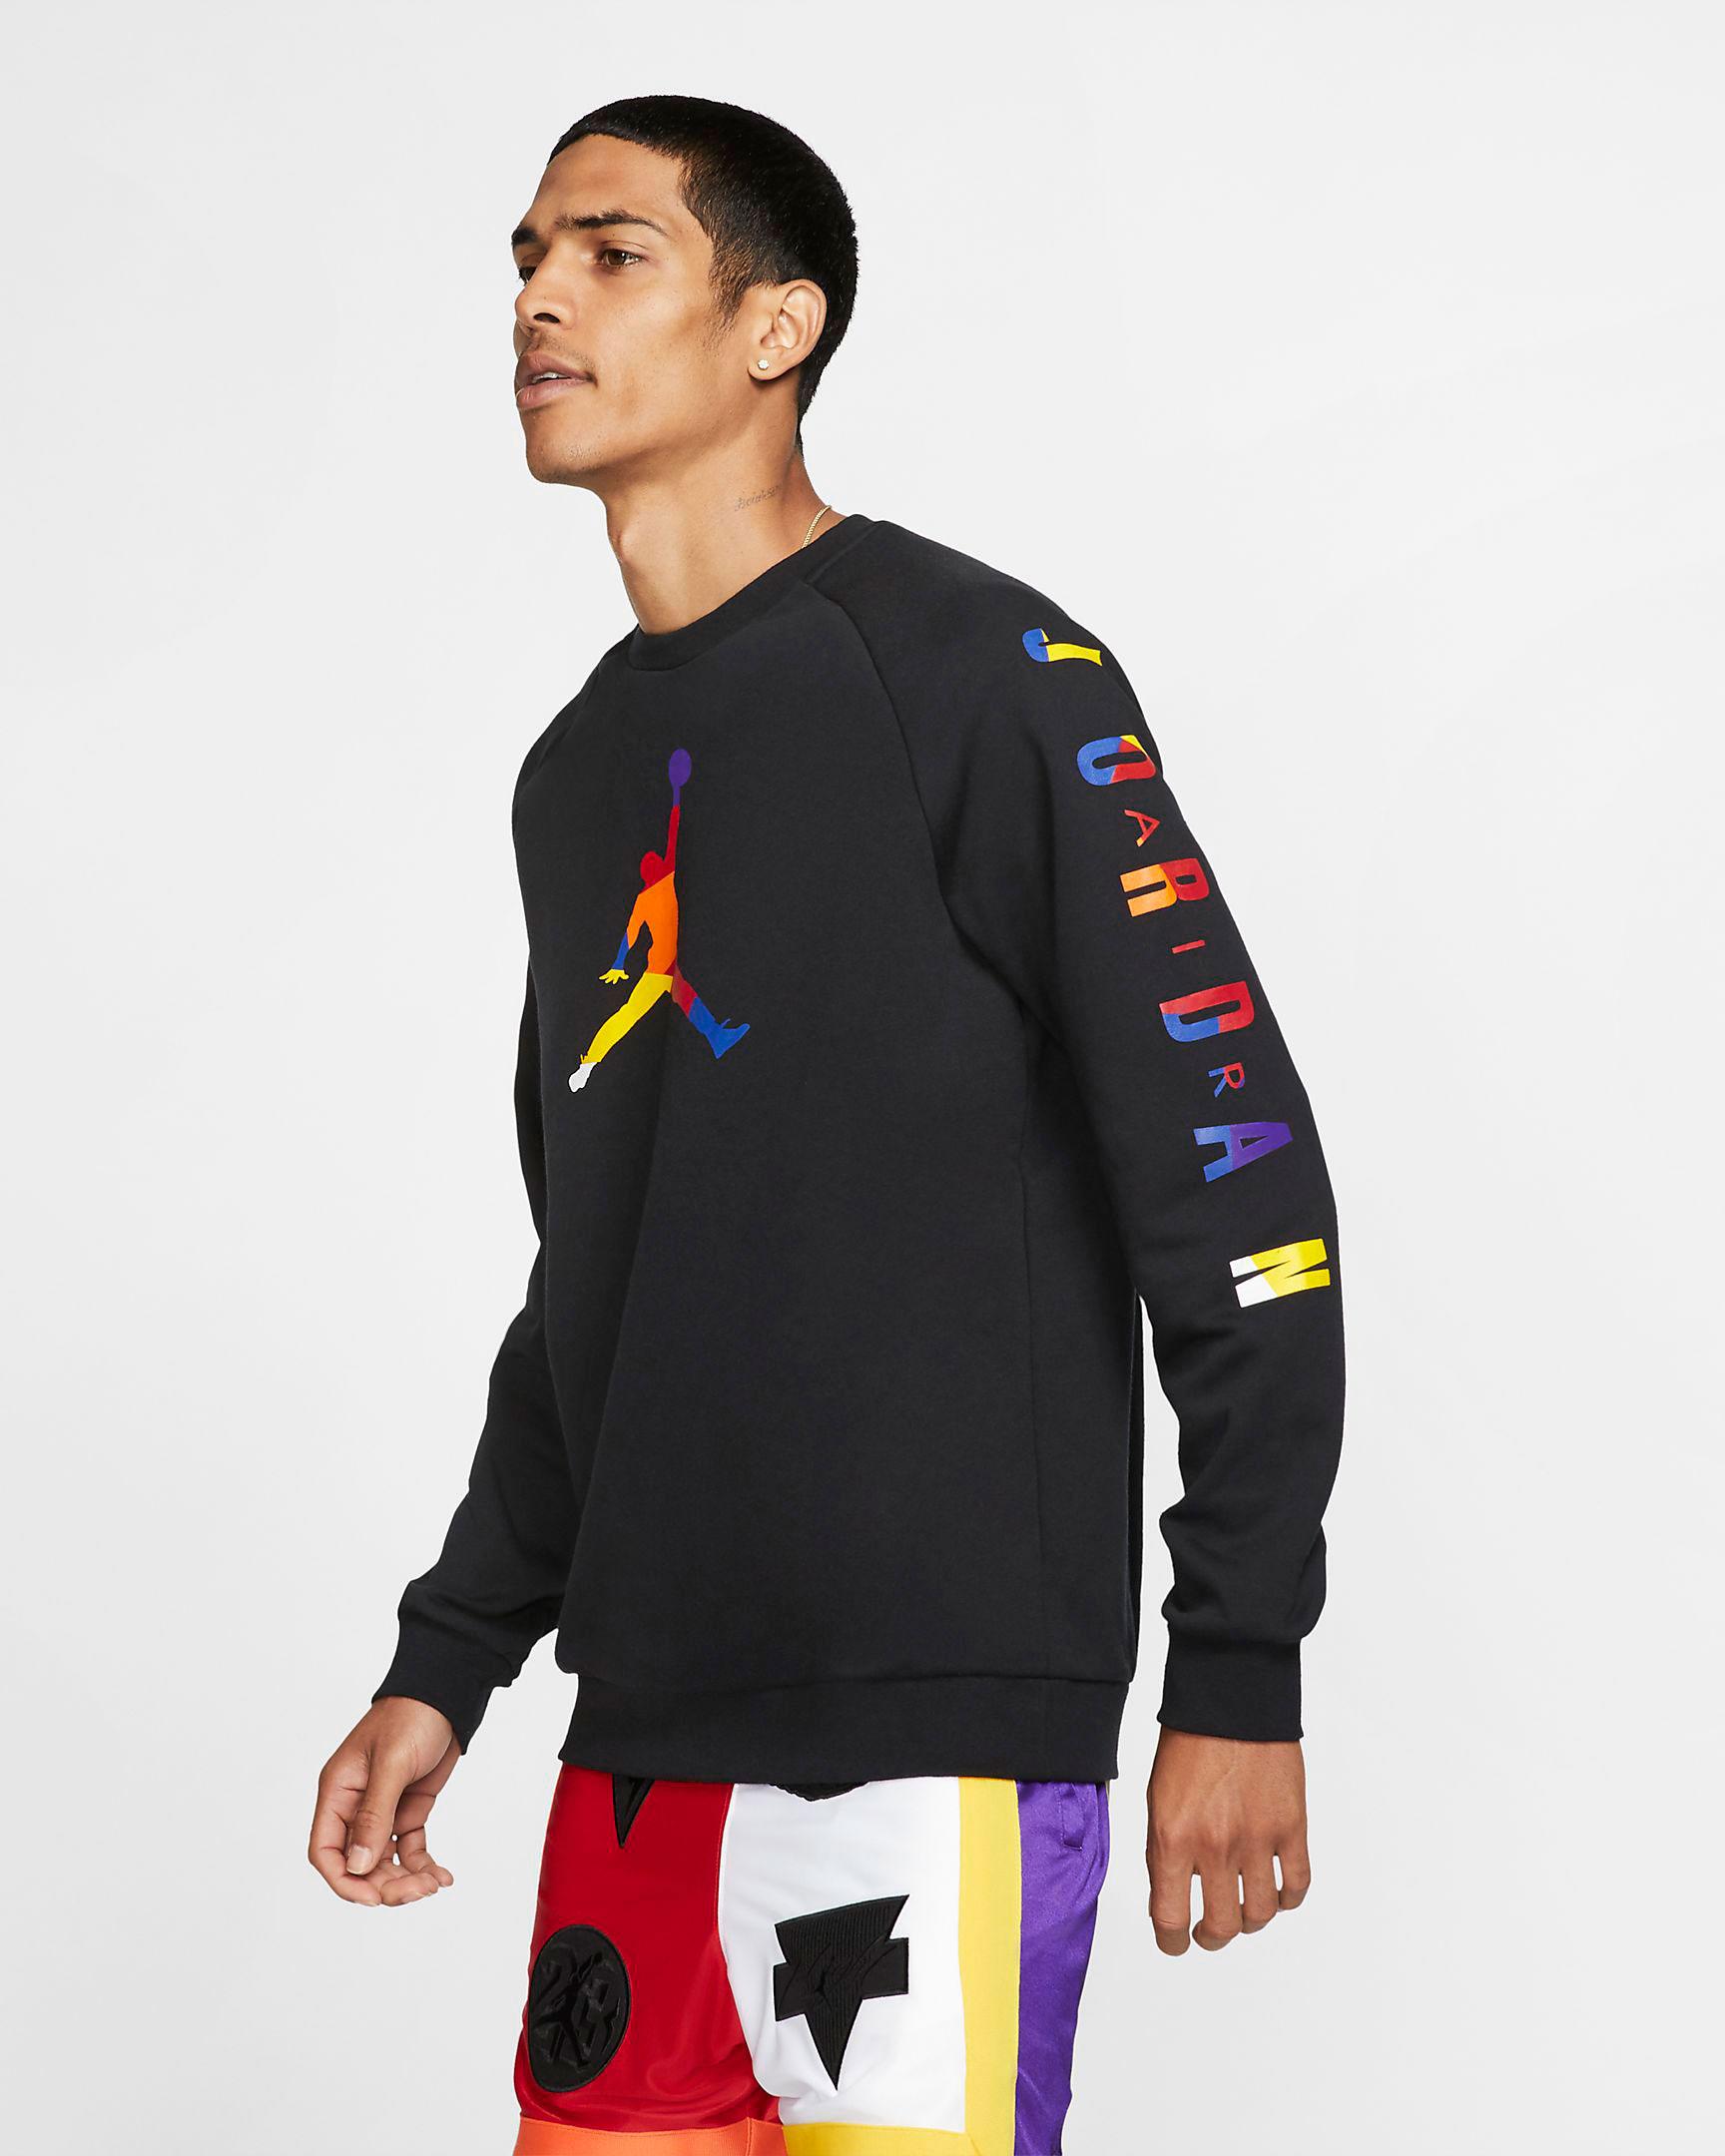 lakers-jordan-13-rivals-sweatshirt-black